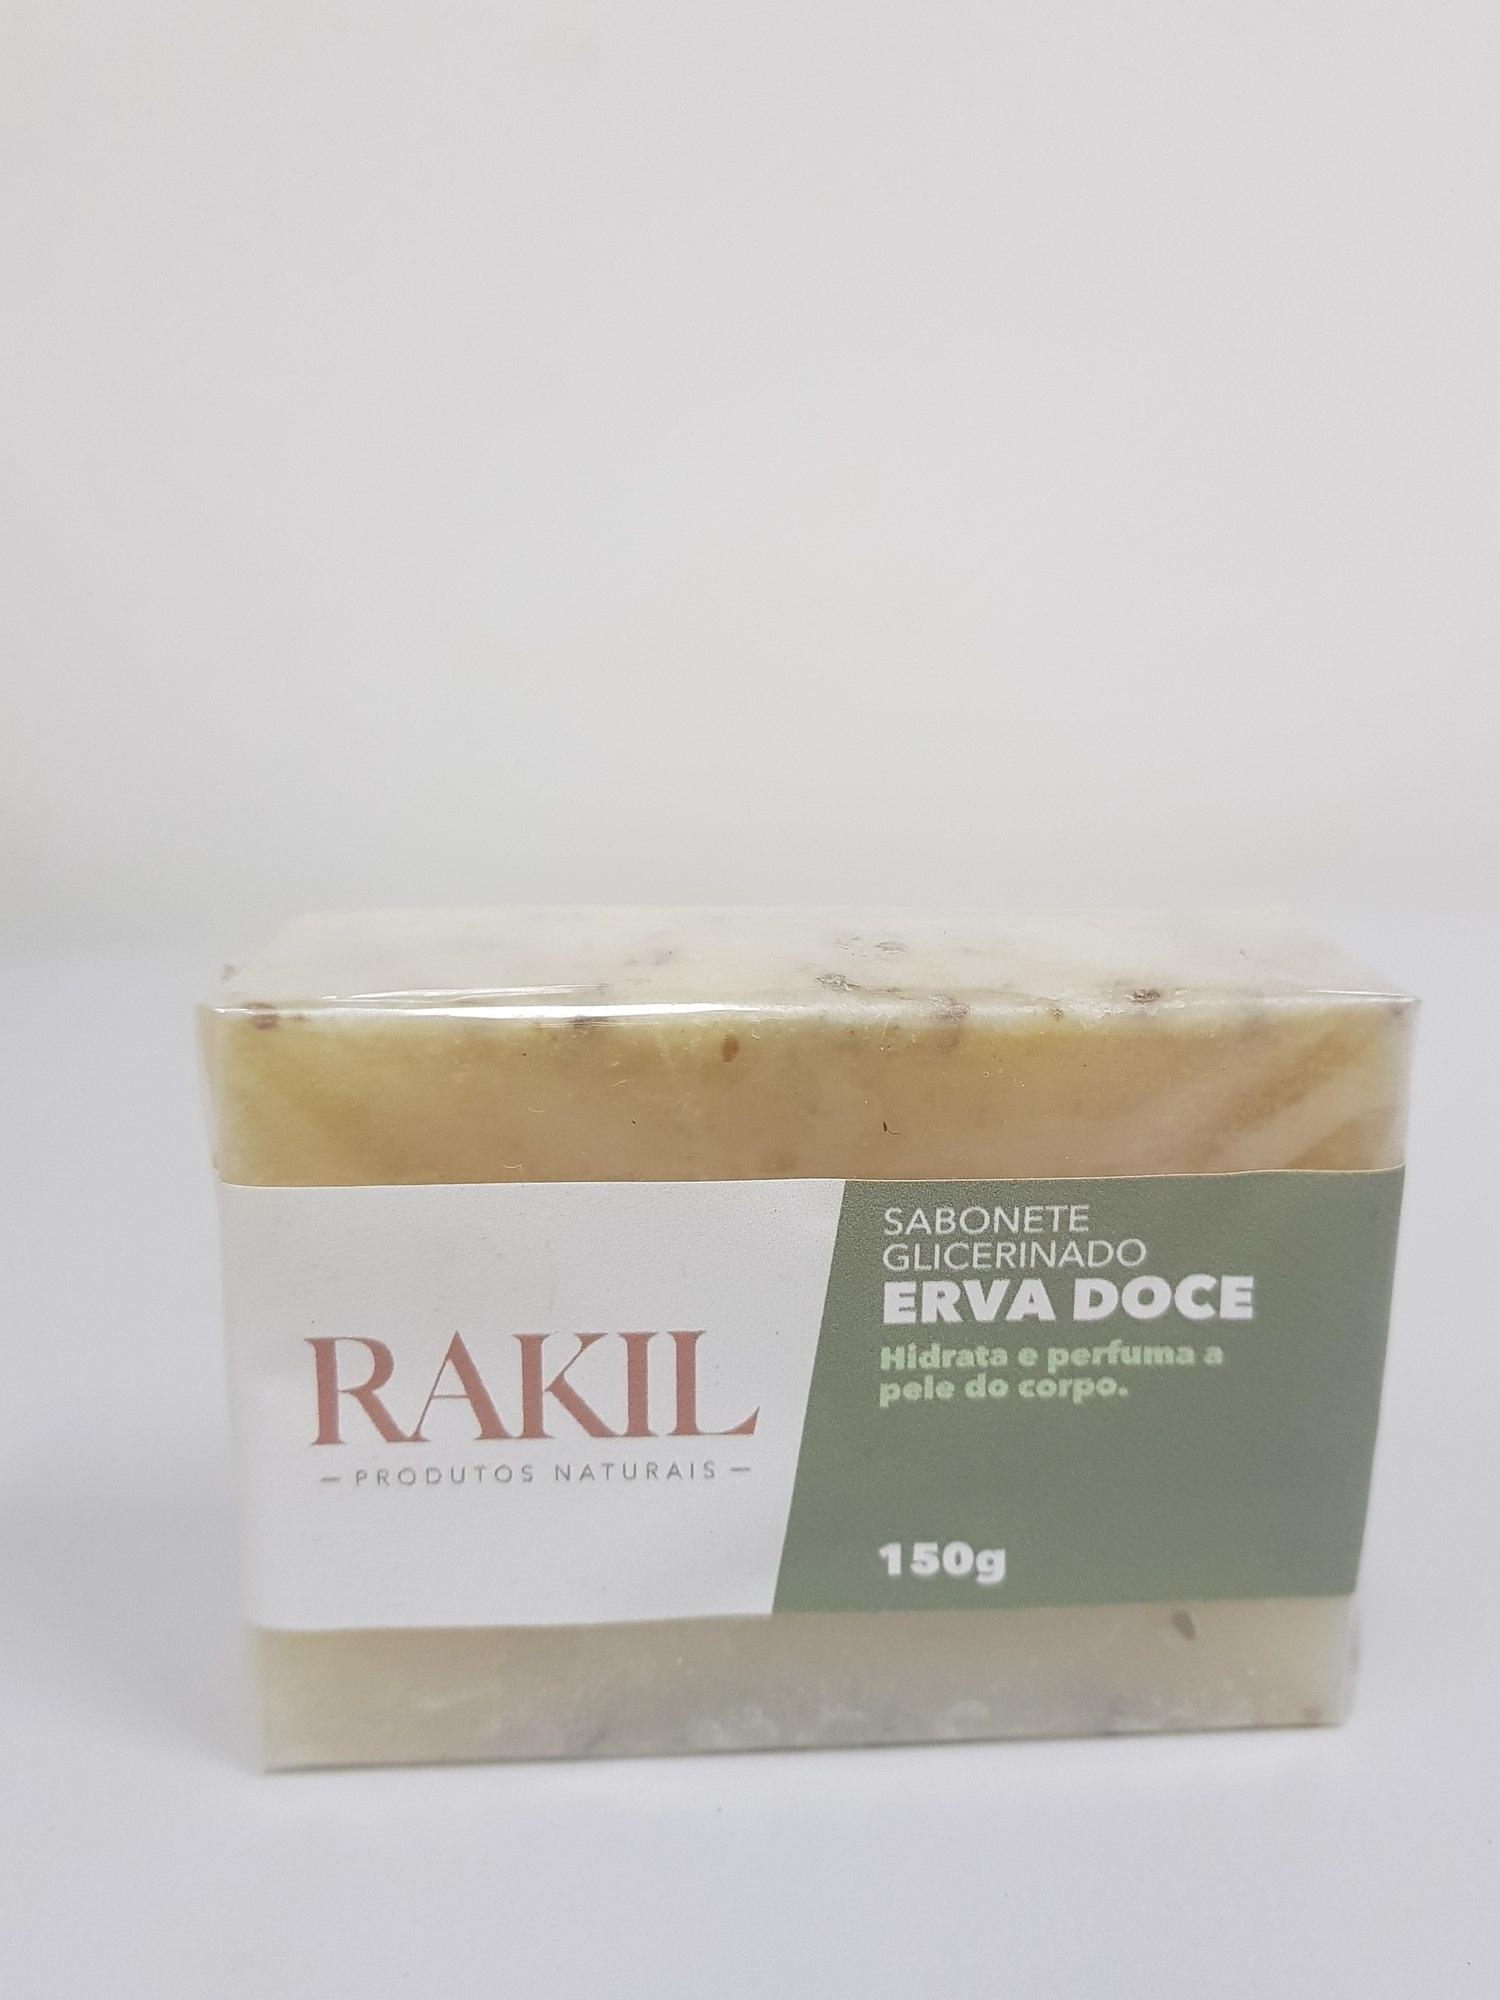 SABONETE GLICERINADO ERVA DOCE 150 g